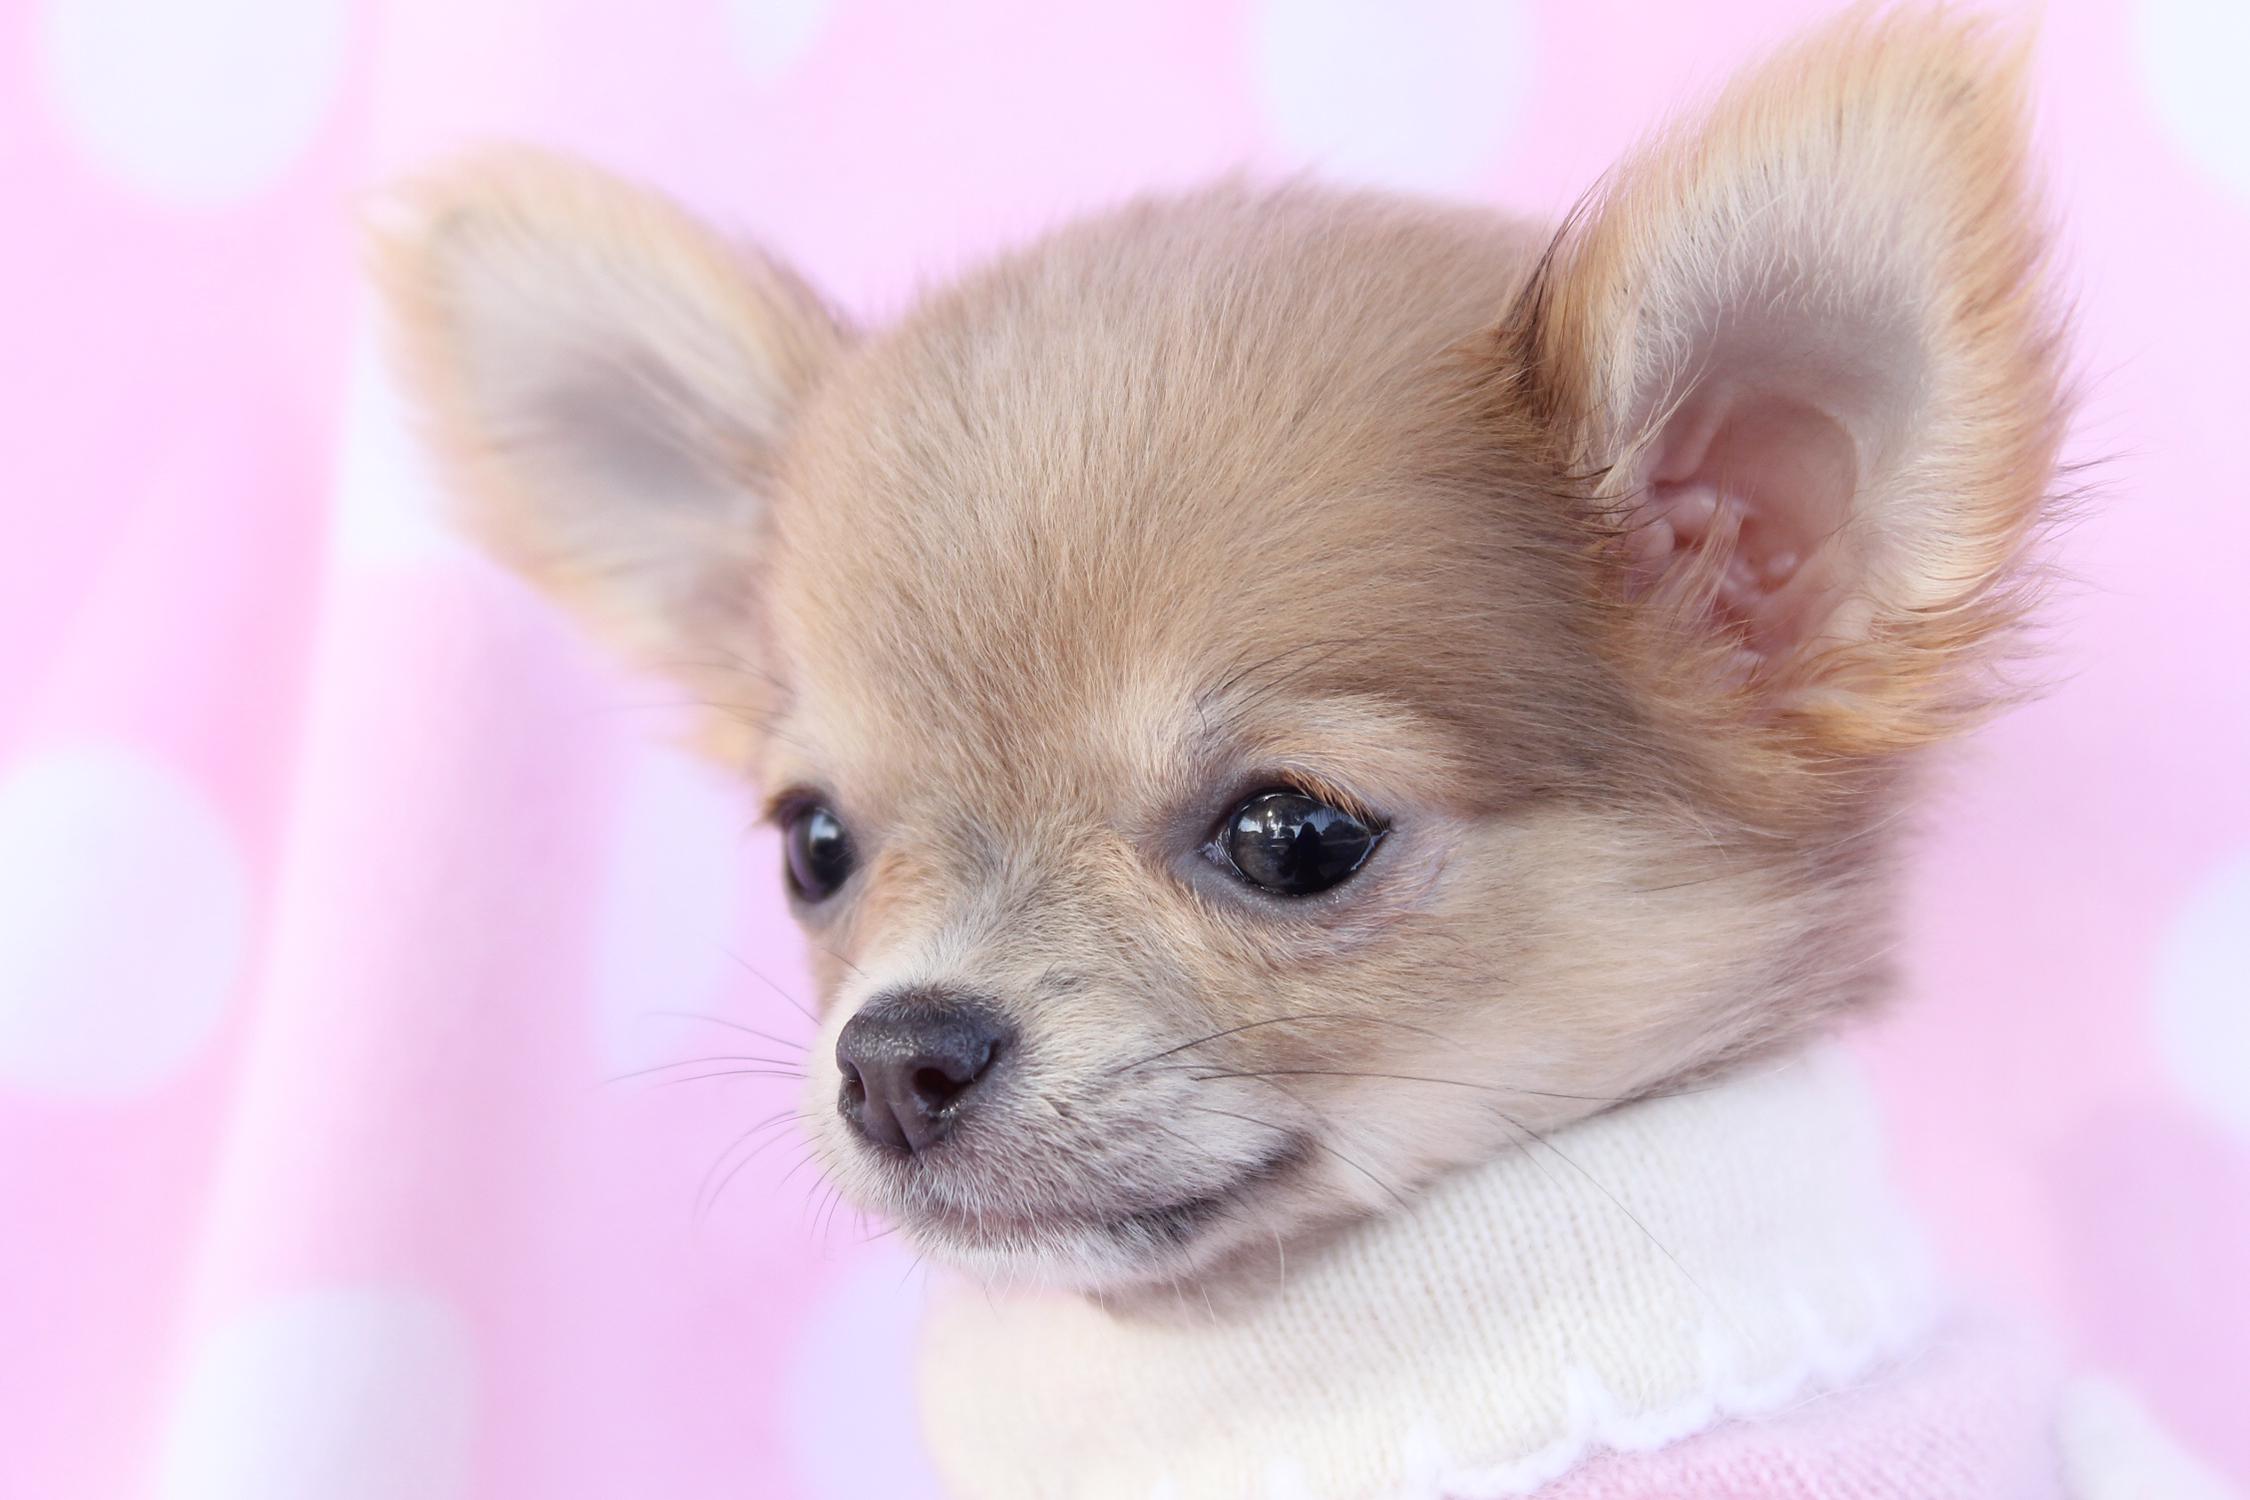 Chihuahua Puppies: Chihuahua Puppy Breed